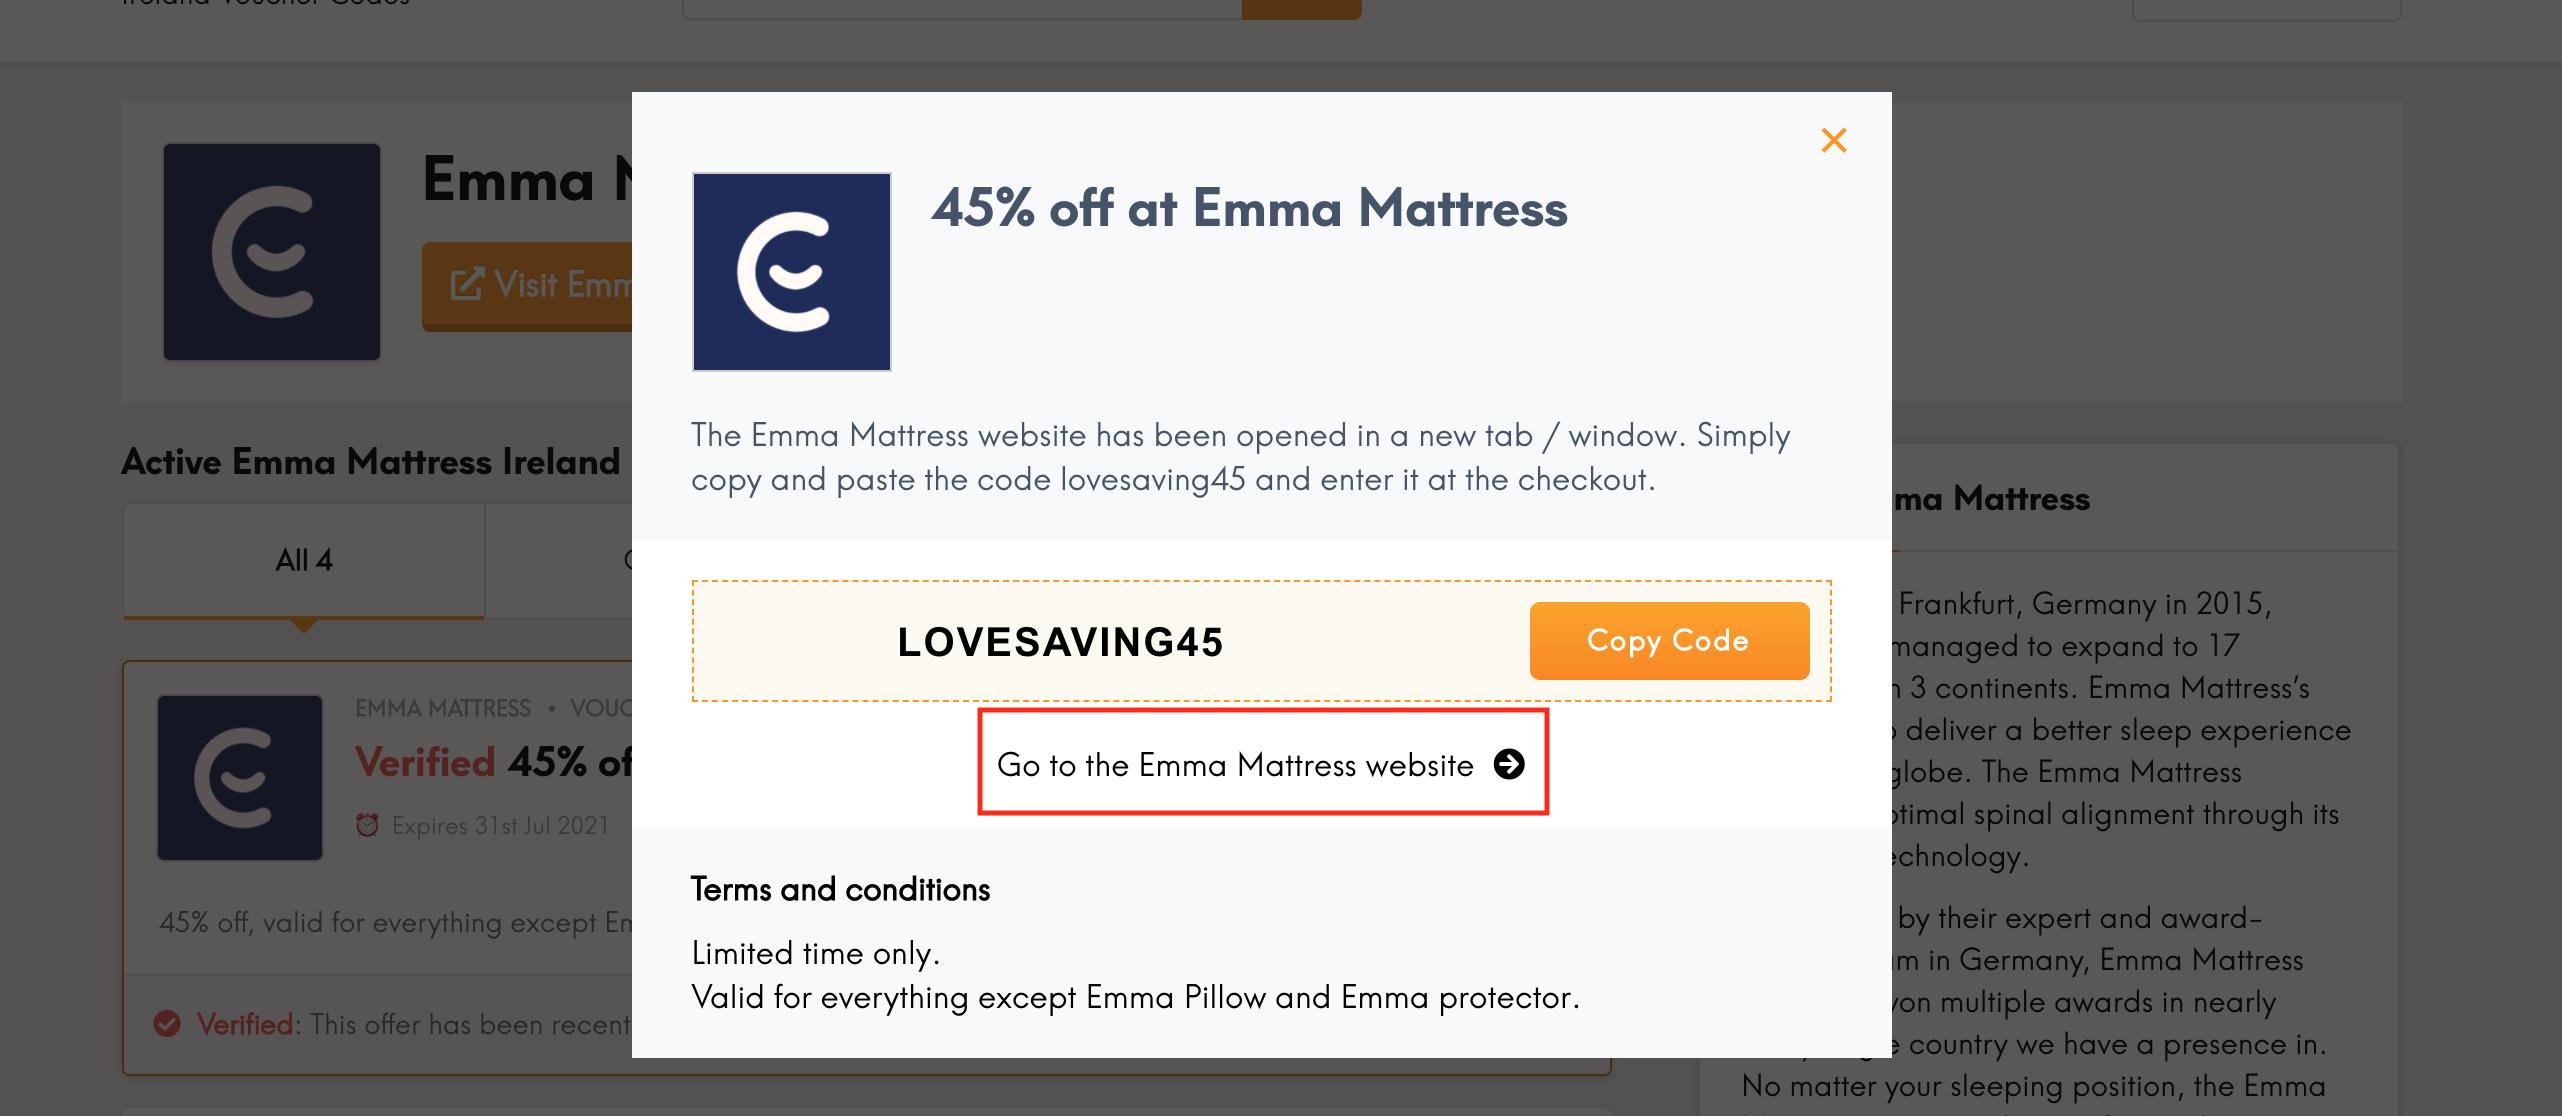 emma mattress go to website